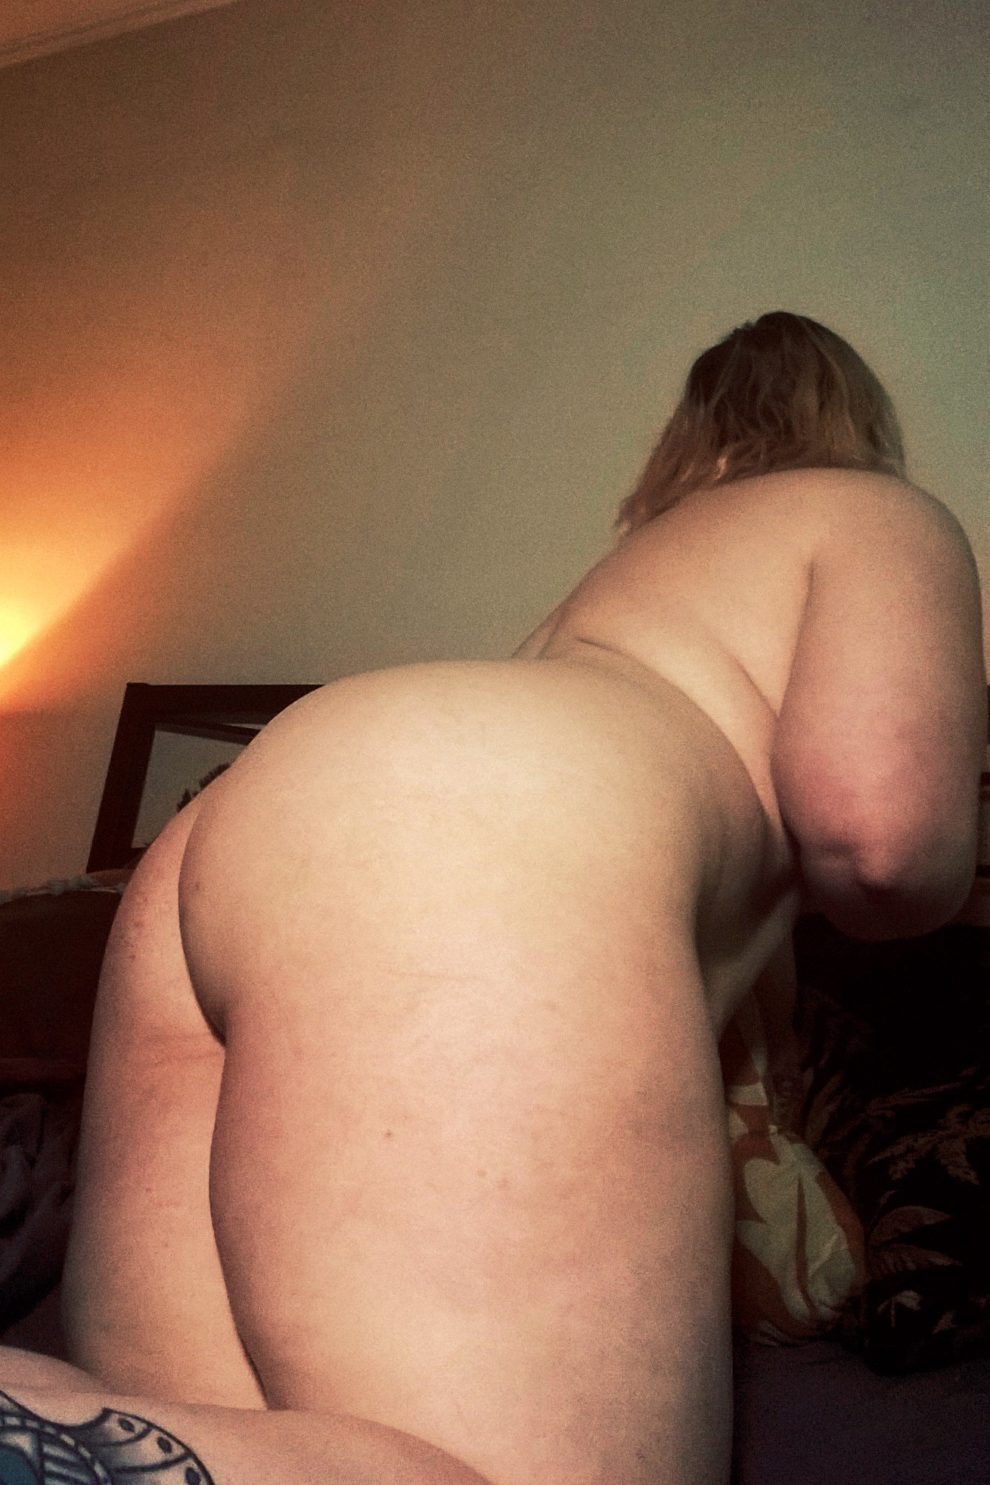 I desperately need a good spanking...